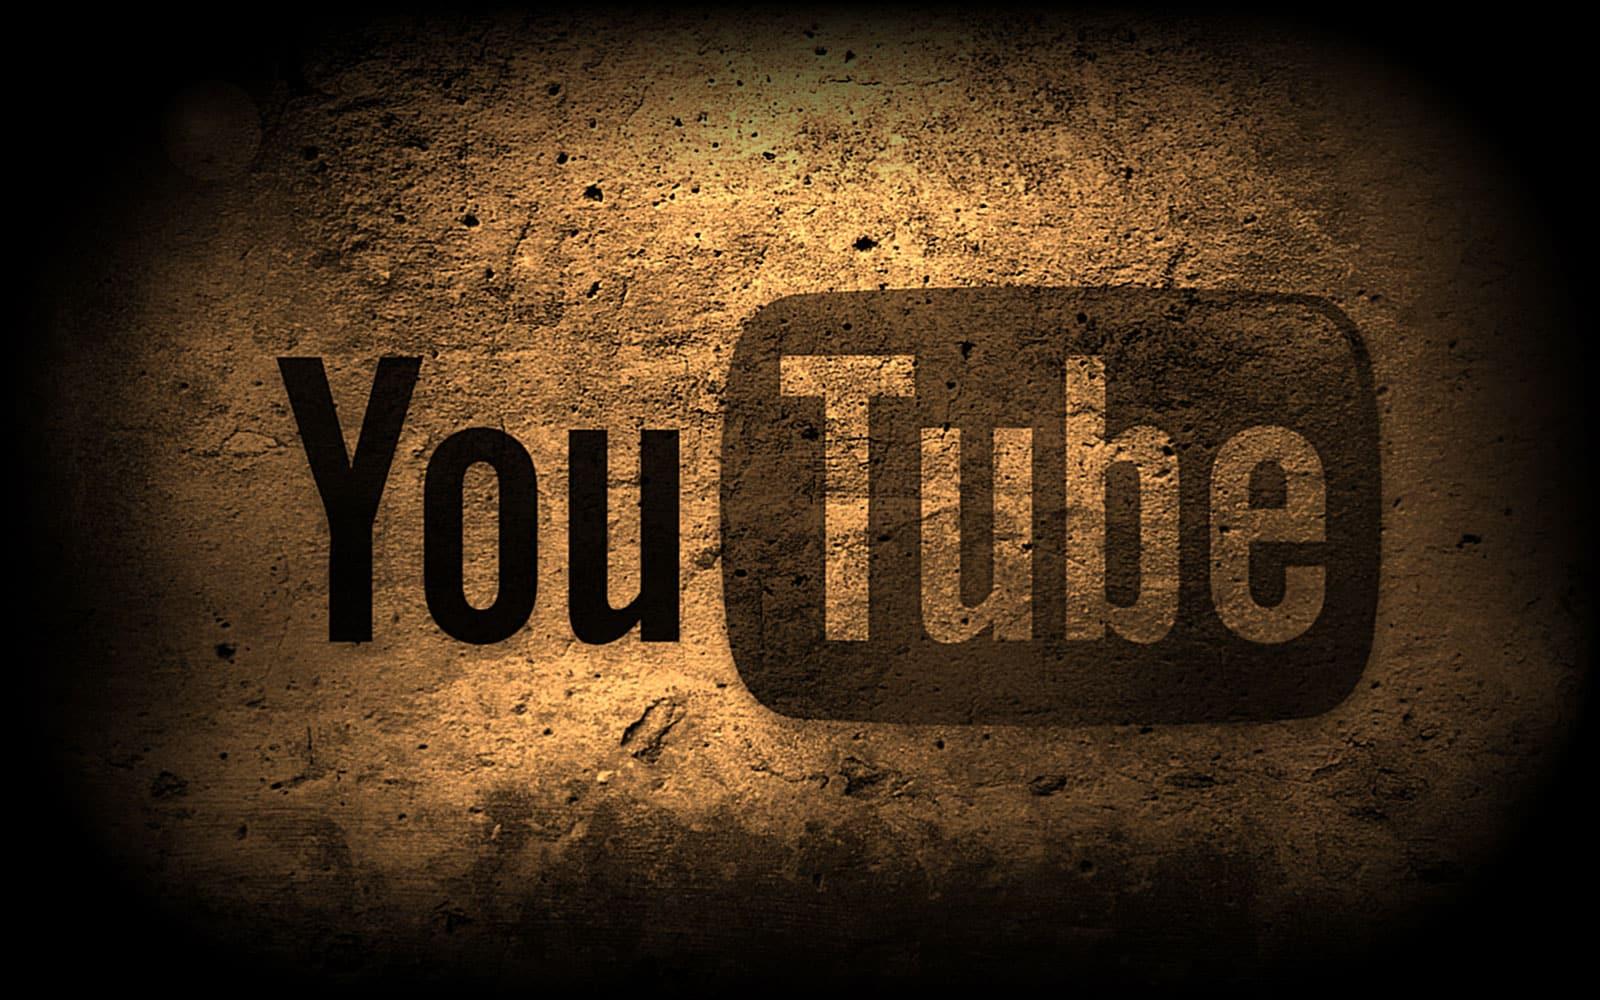 youtube لماذا نسخ الفيديوهات و قنوات يوتيوب عن طريق RDP مخالف و سيء؟